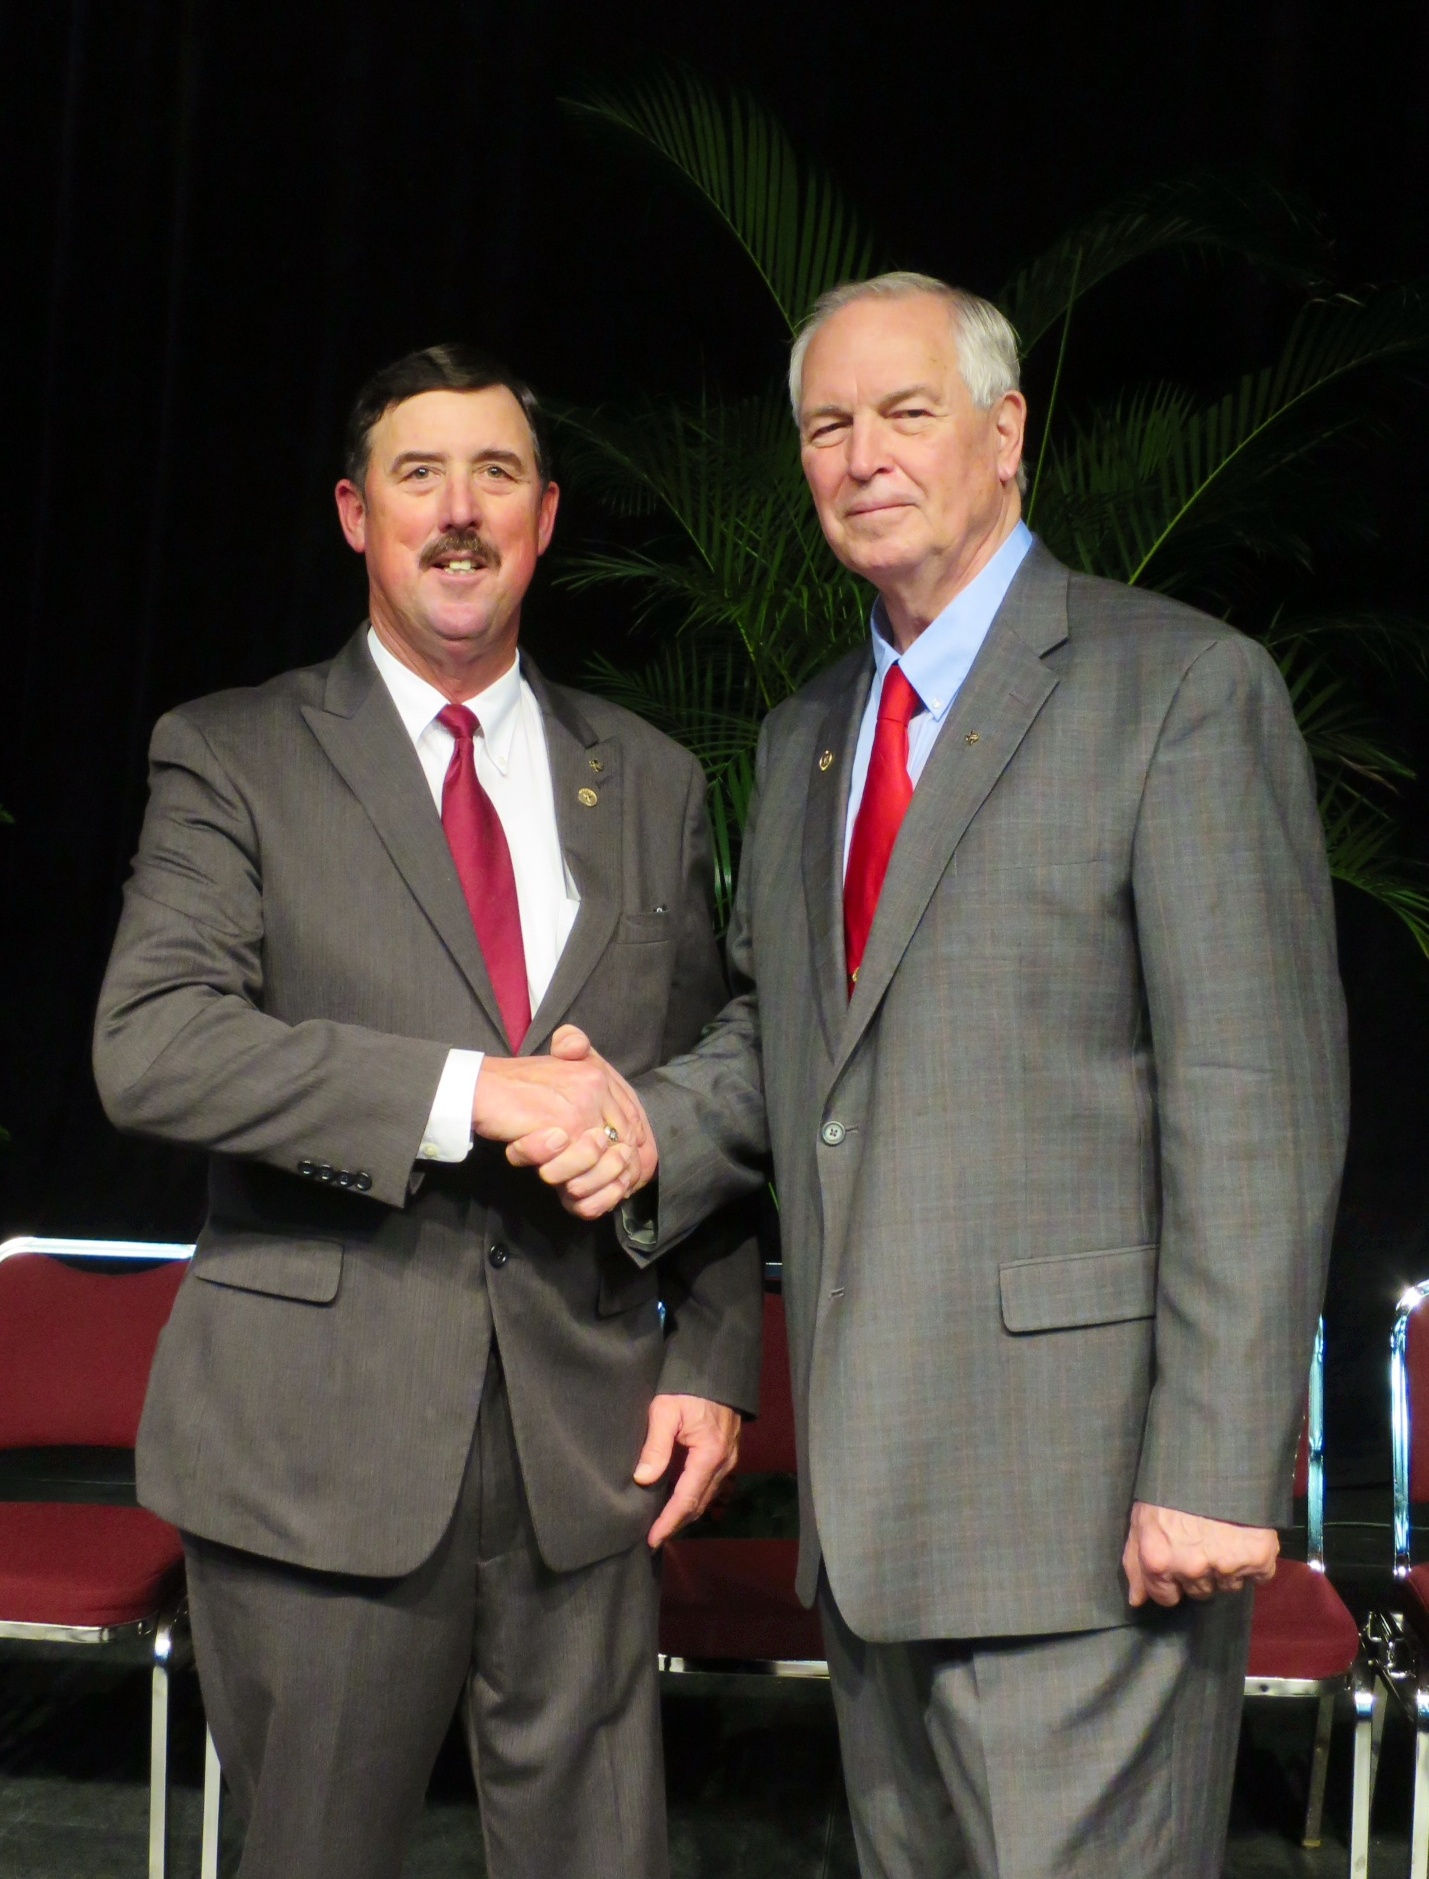 Russell Boening (left)—a South Texas dairyman, farmer and rancher— was elected the 10th president of Texas Farm Bureau. Past President Kenneth Dierschke (right) congratulates him.